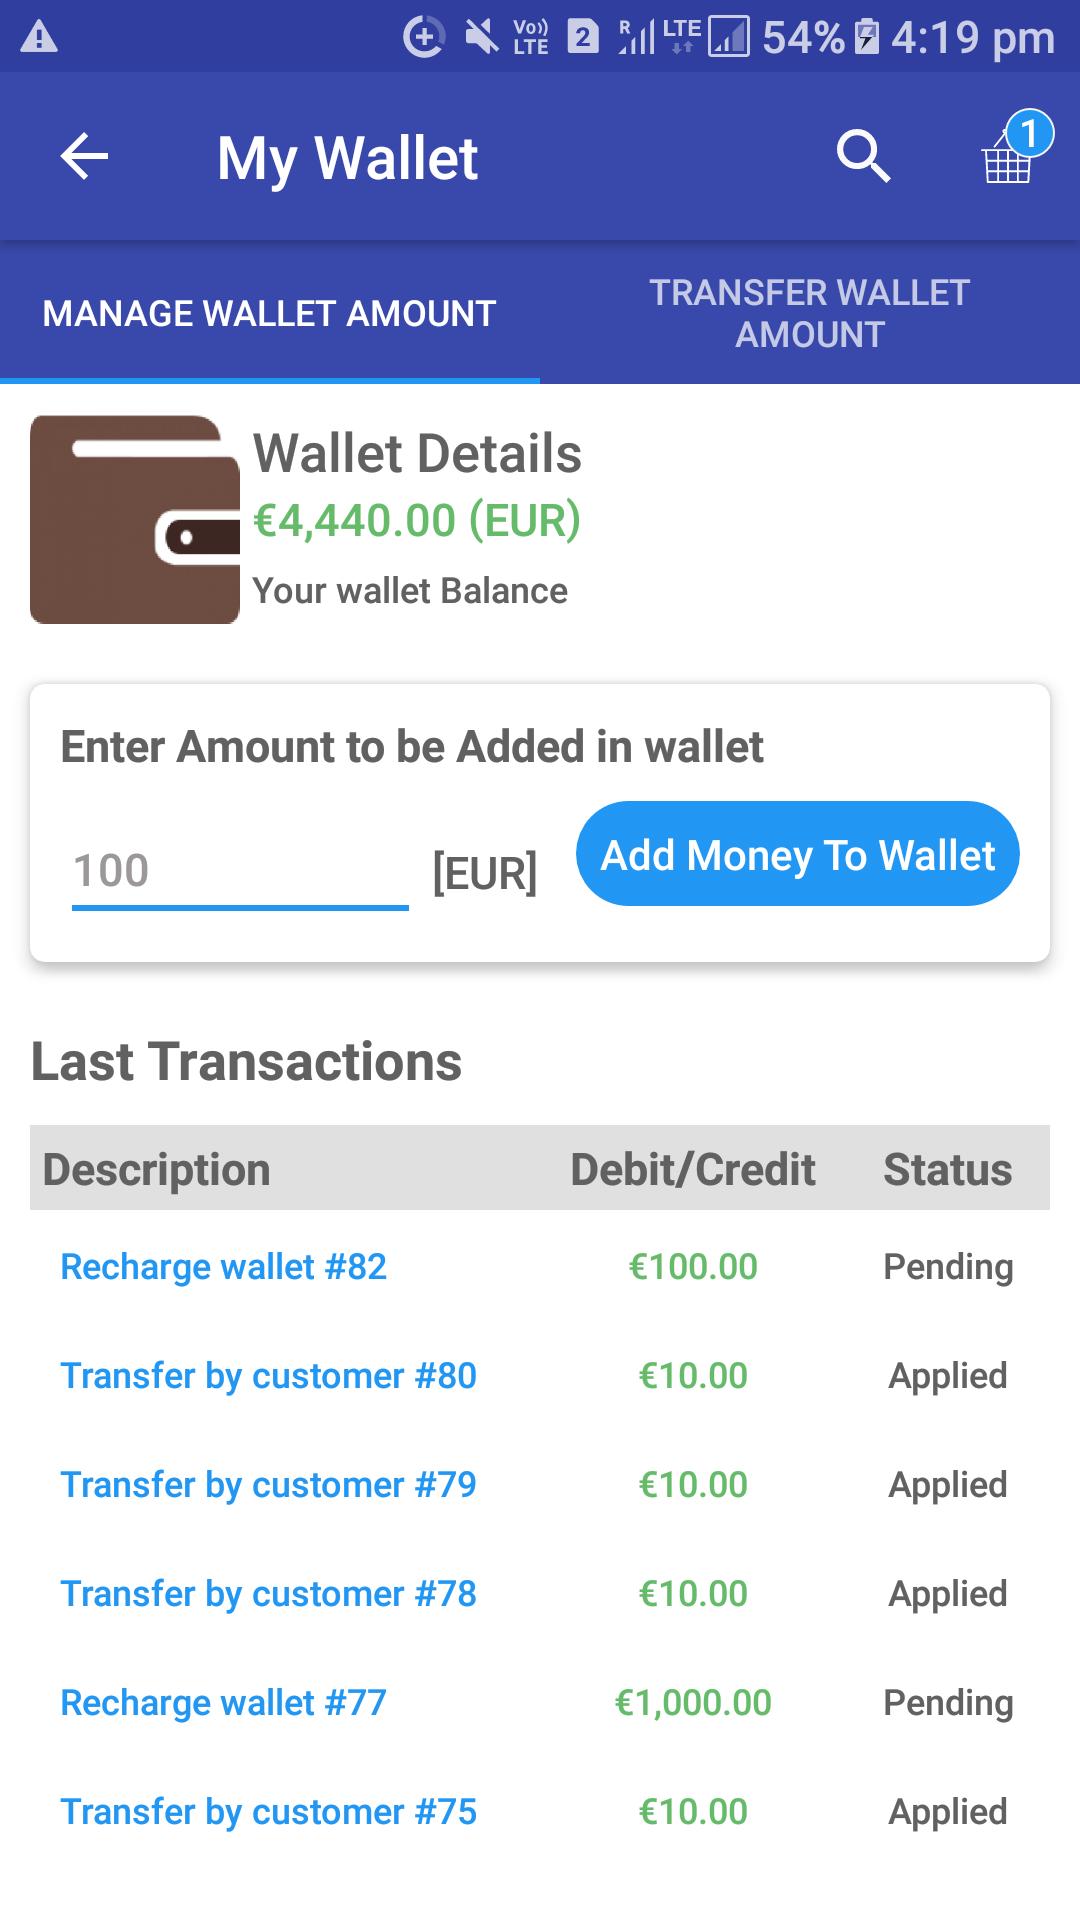 Opencart Mobikul Wallet - Check Transaction Details